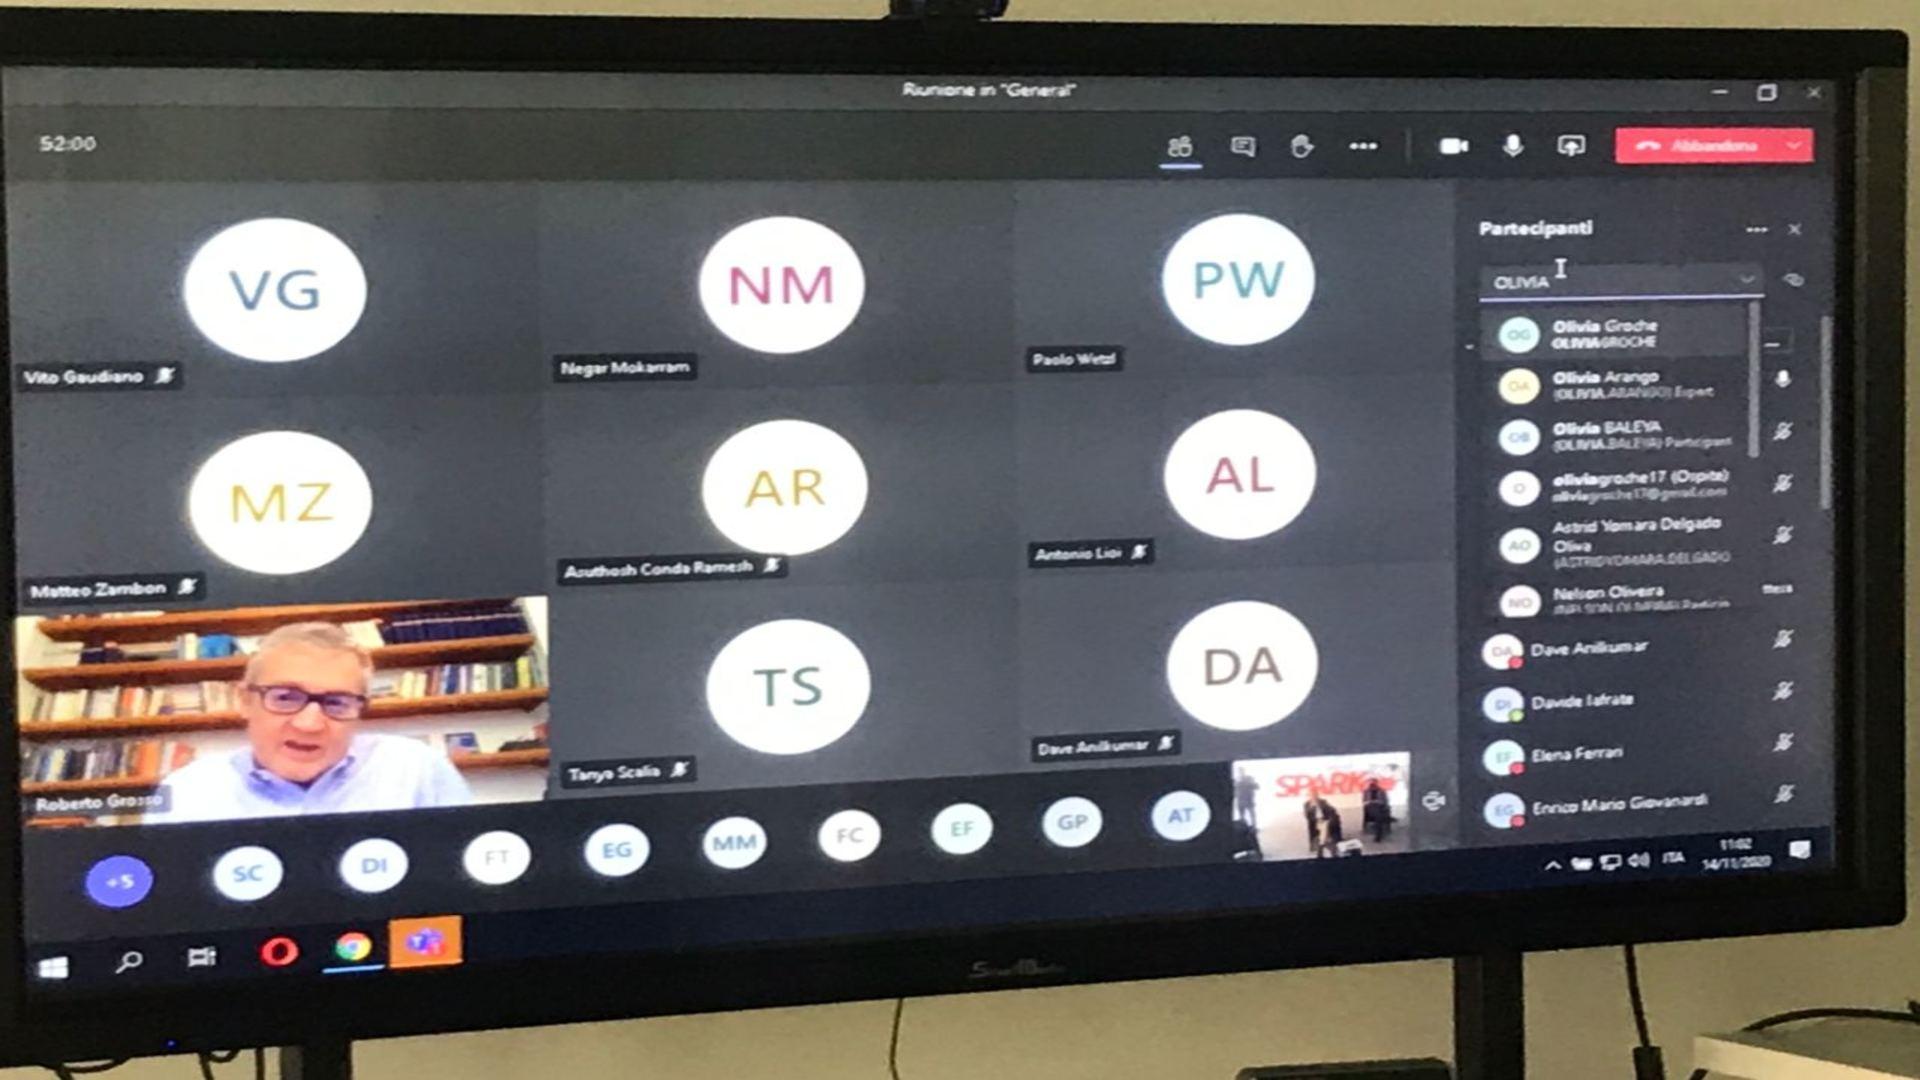 ASI - ActInSpace 2020, successo per l'hackathon virtuale